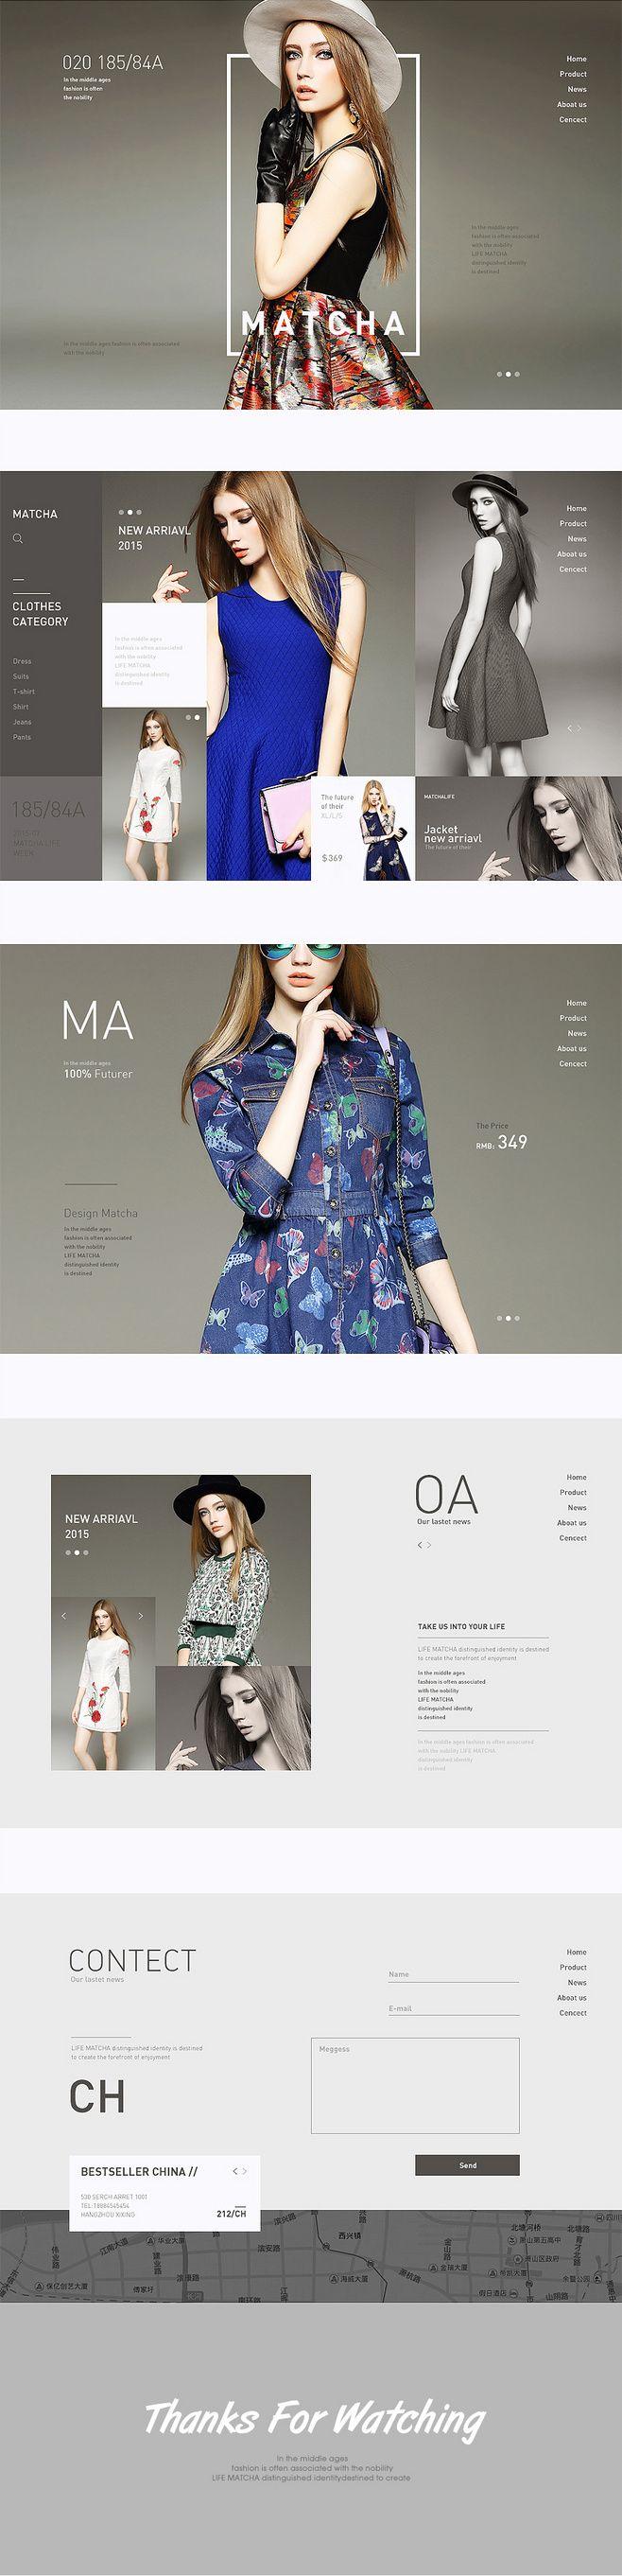 Gallery: Modern & Trendy Web Designs